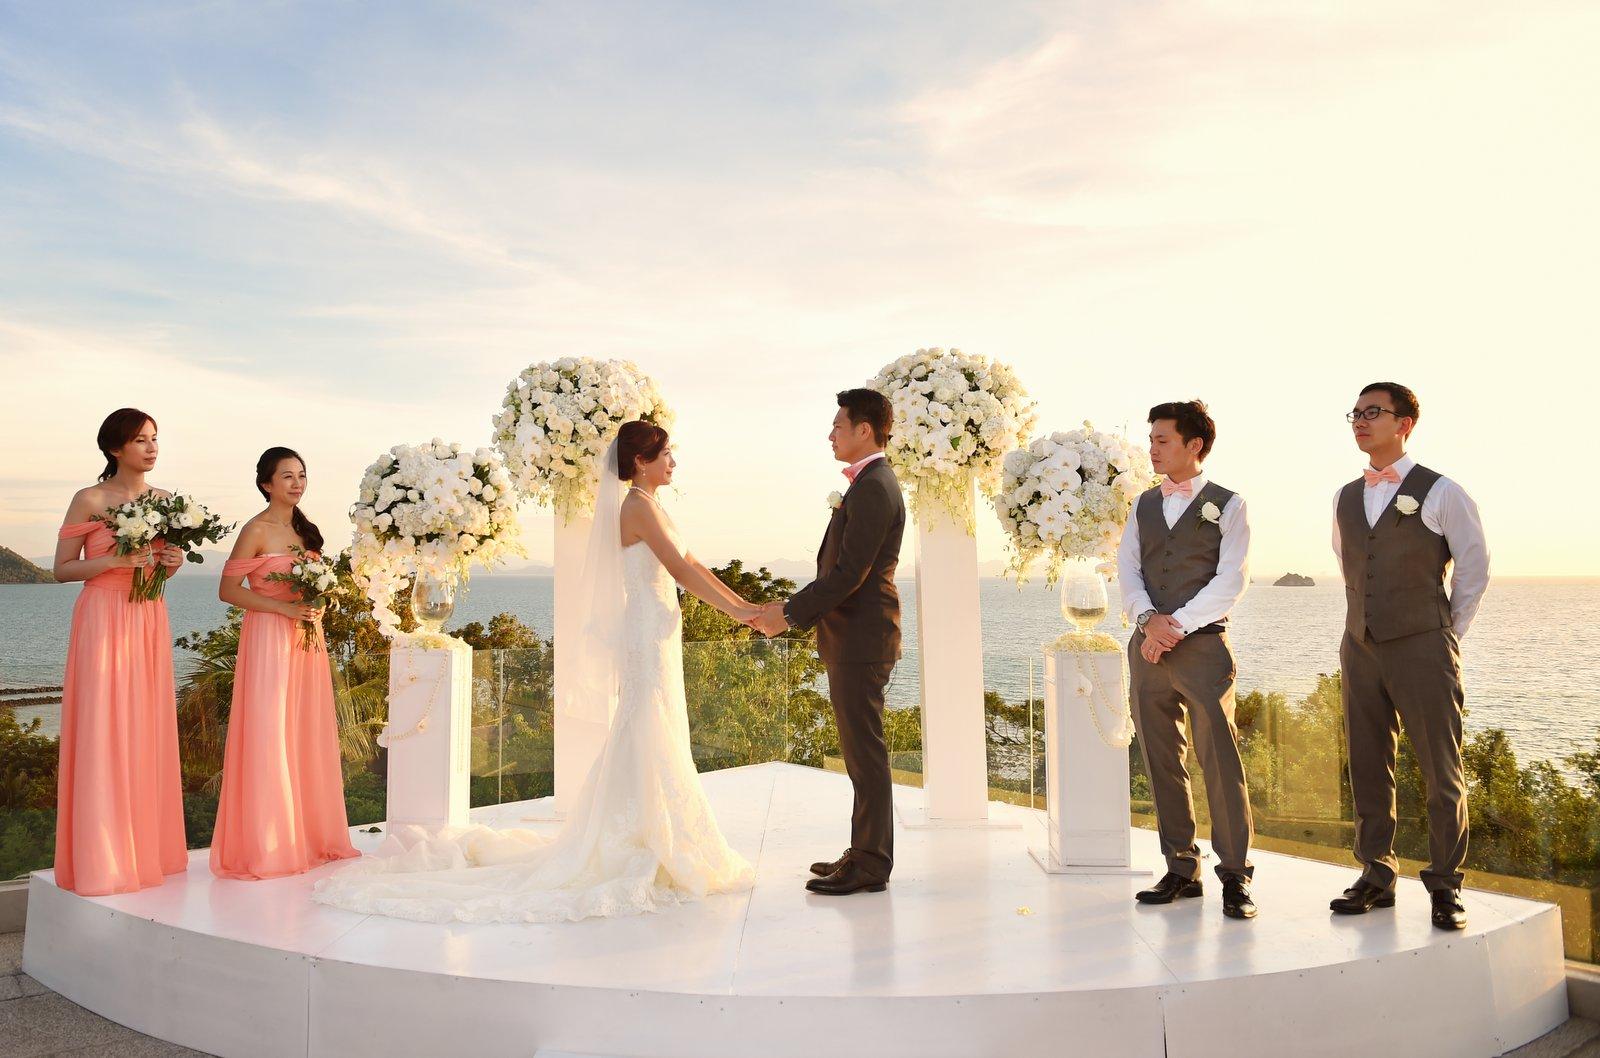 Beach Wedding Ceremony Oahu: Top Destination Wedding Locations In Asia